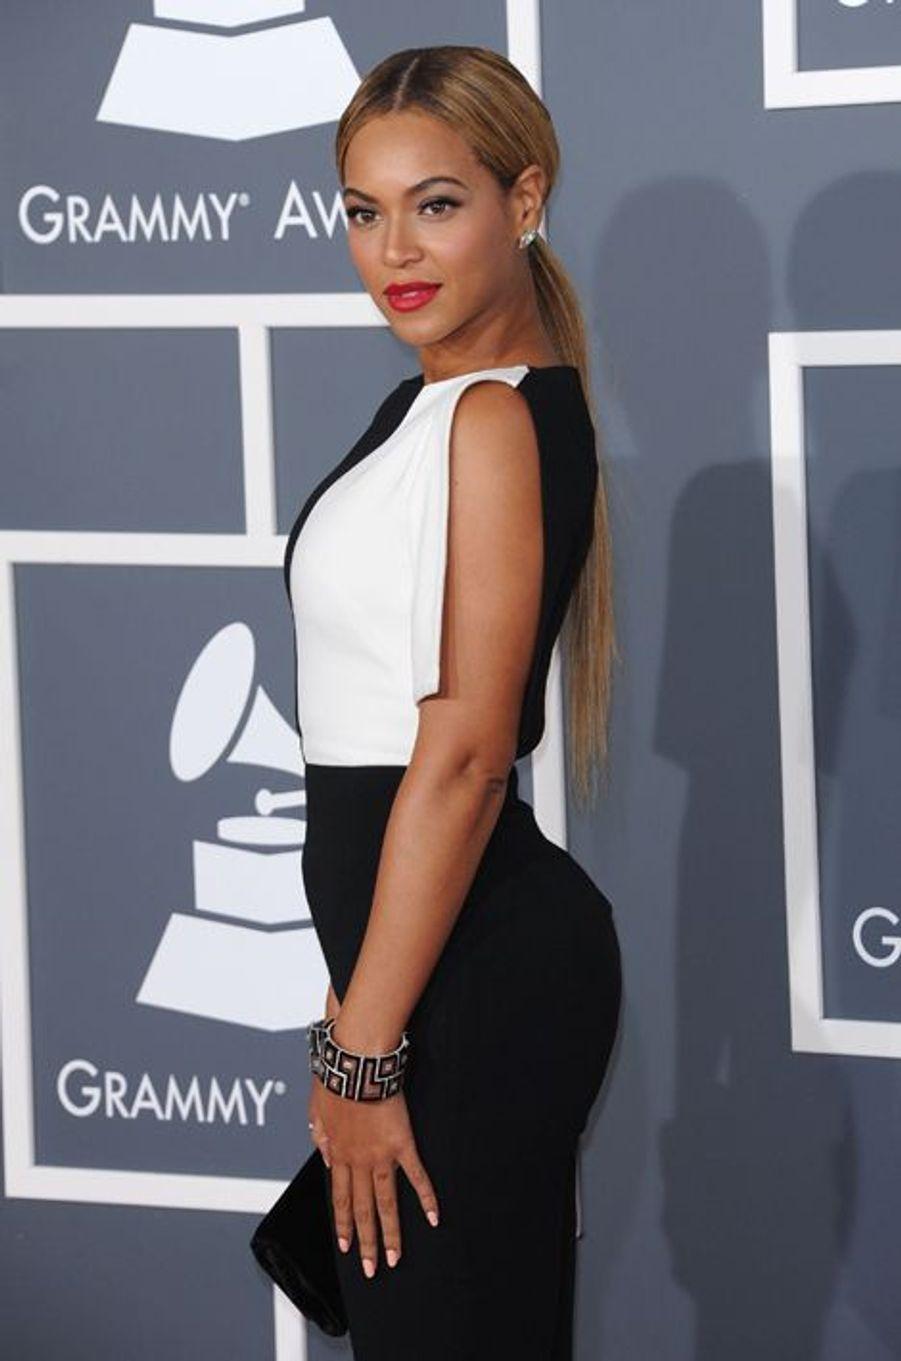 En février 2013 aux Grammy Awards